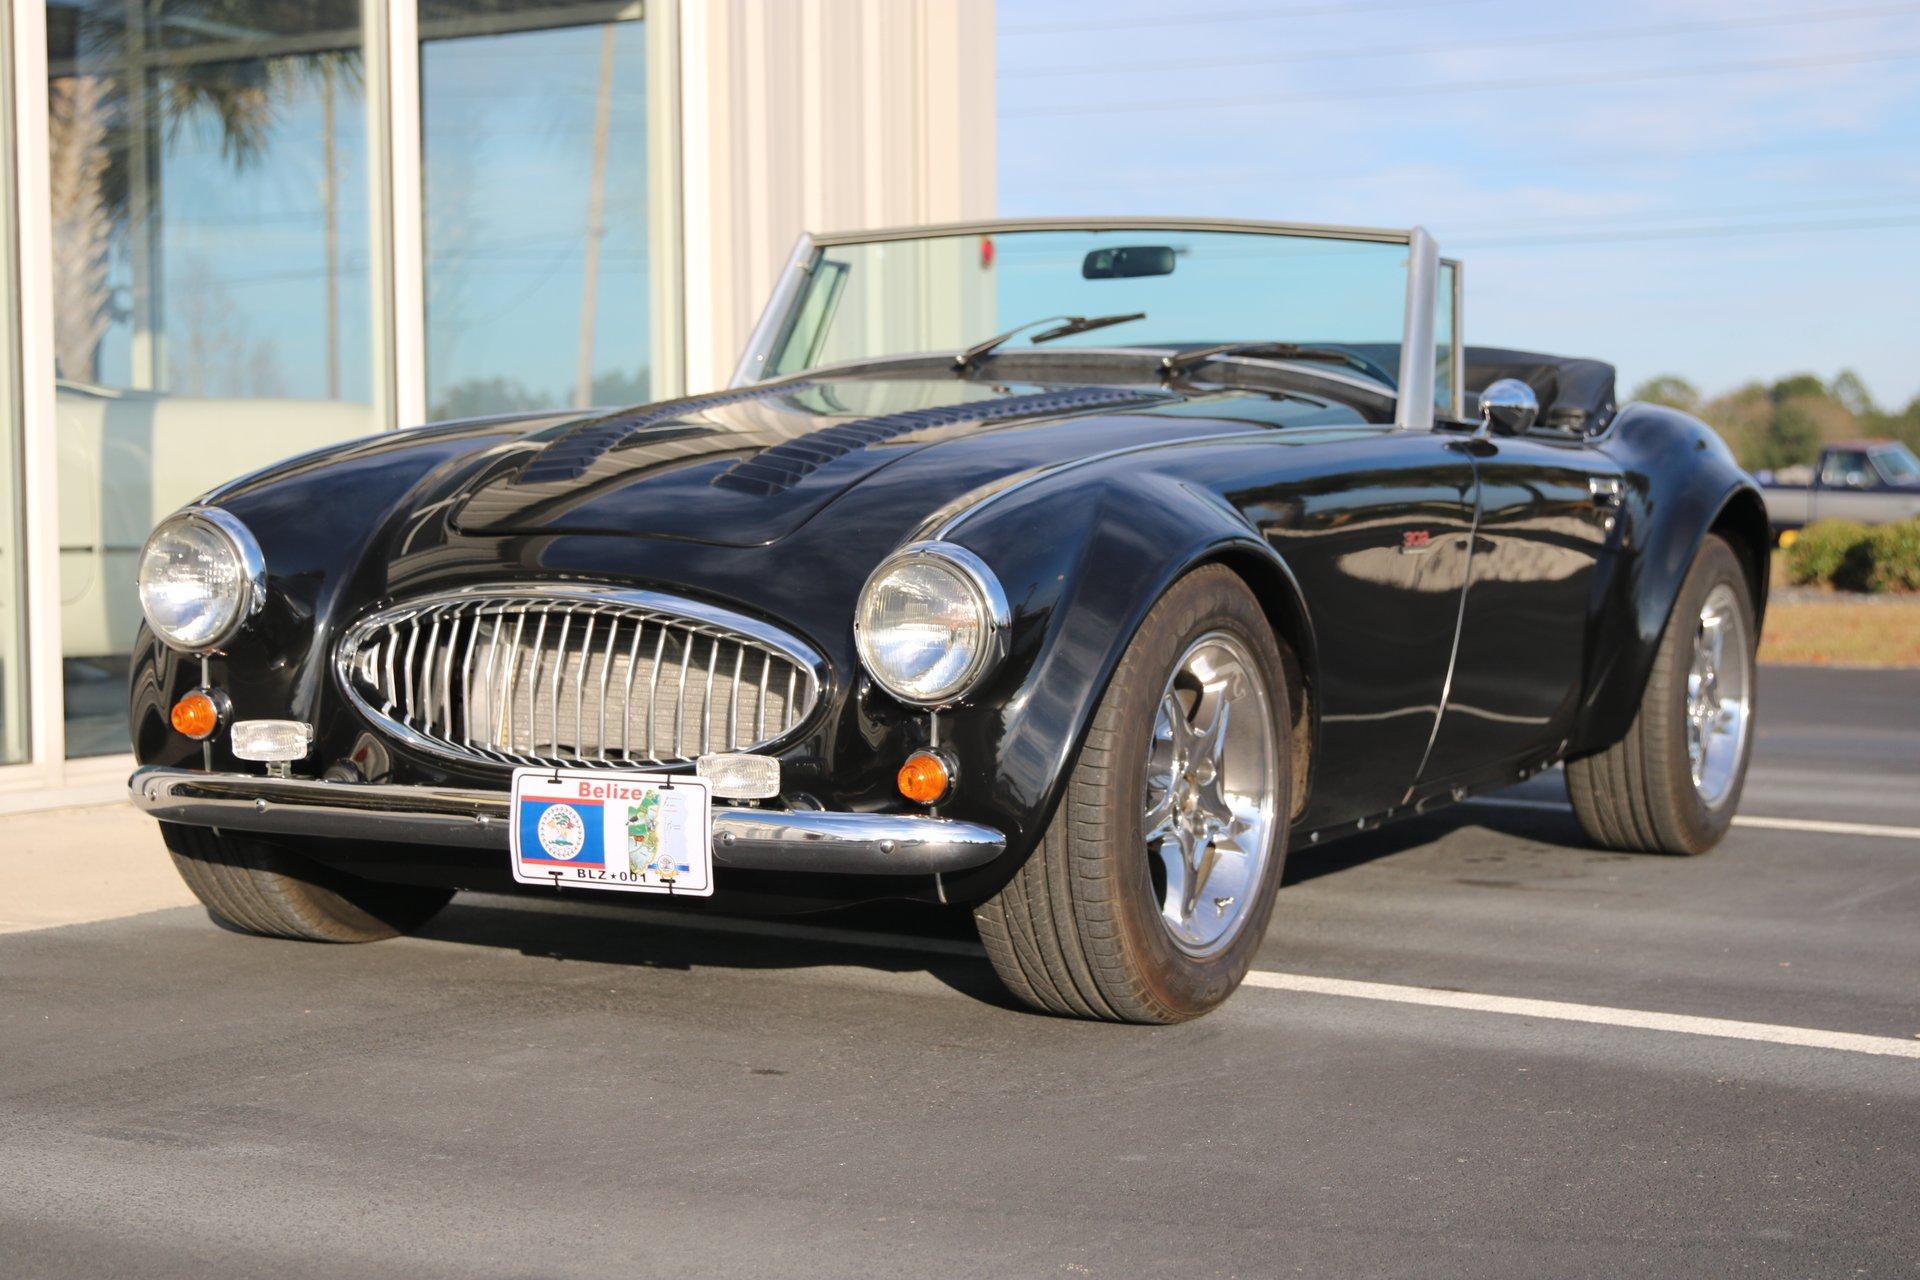 2000 austin healey sebring replica kit car